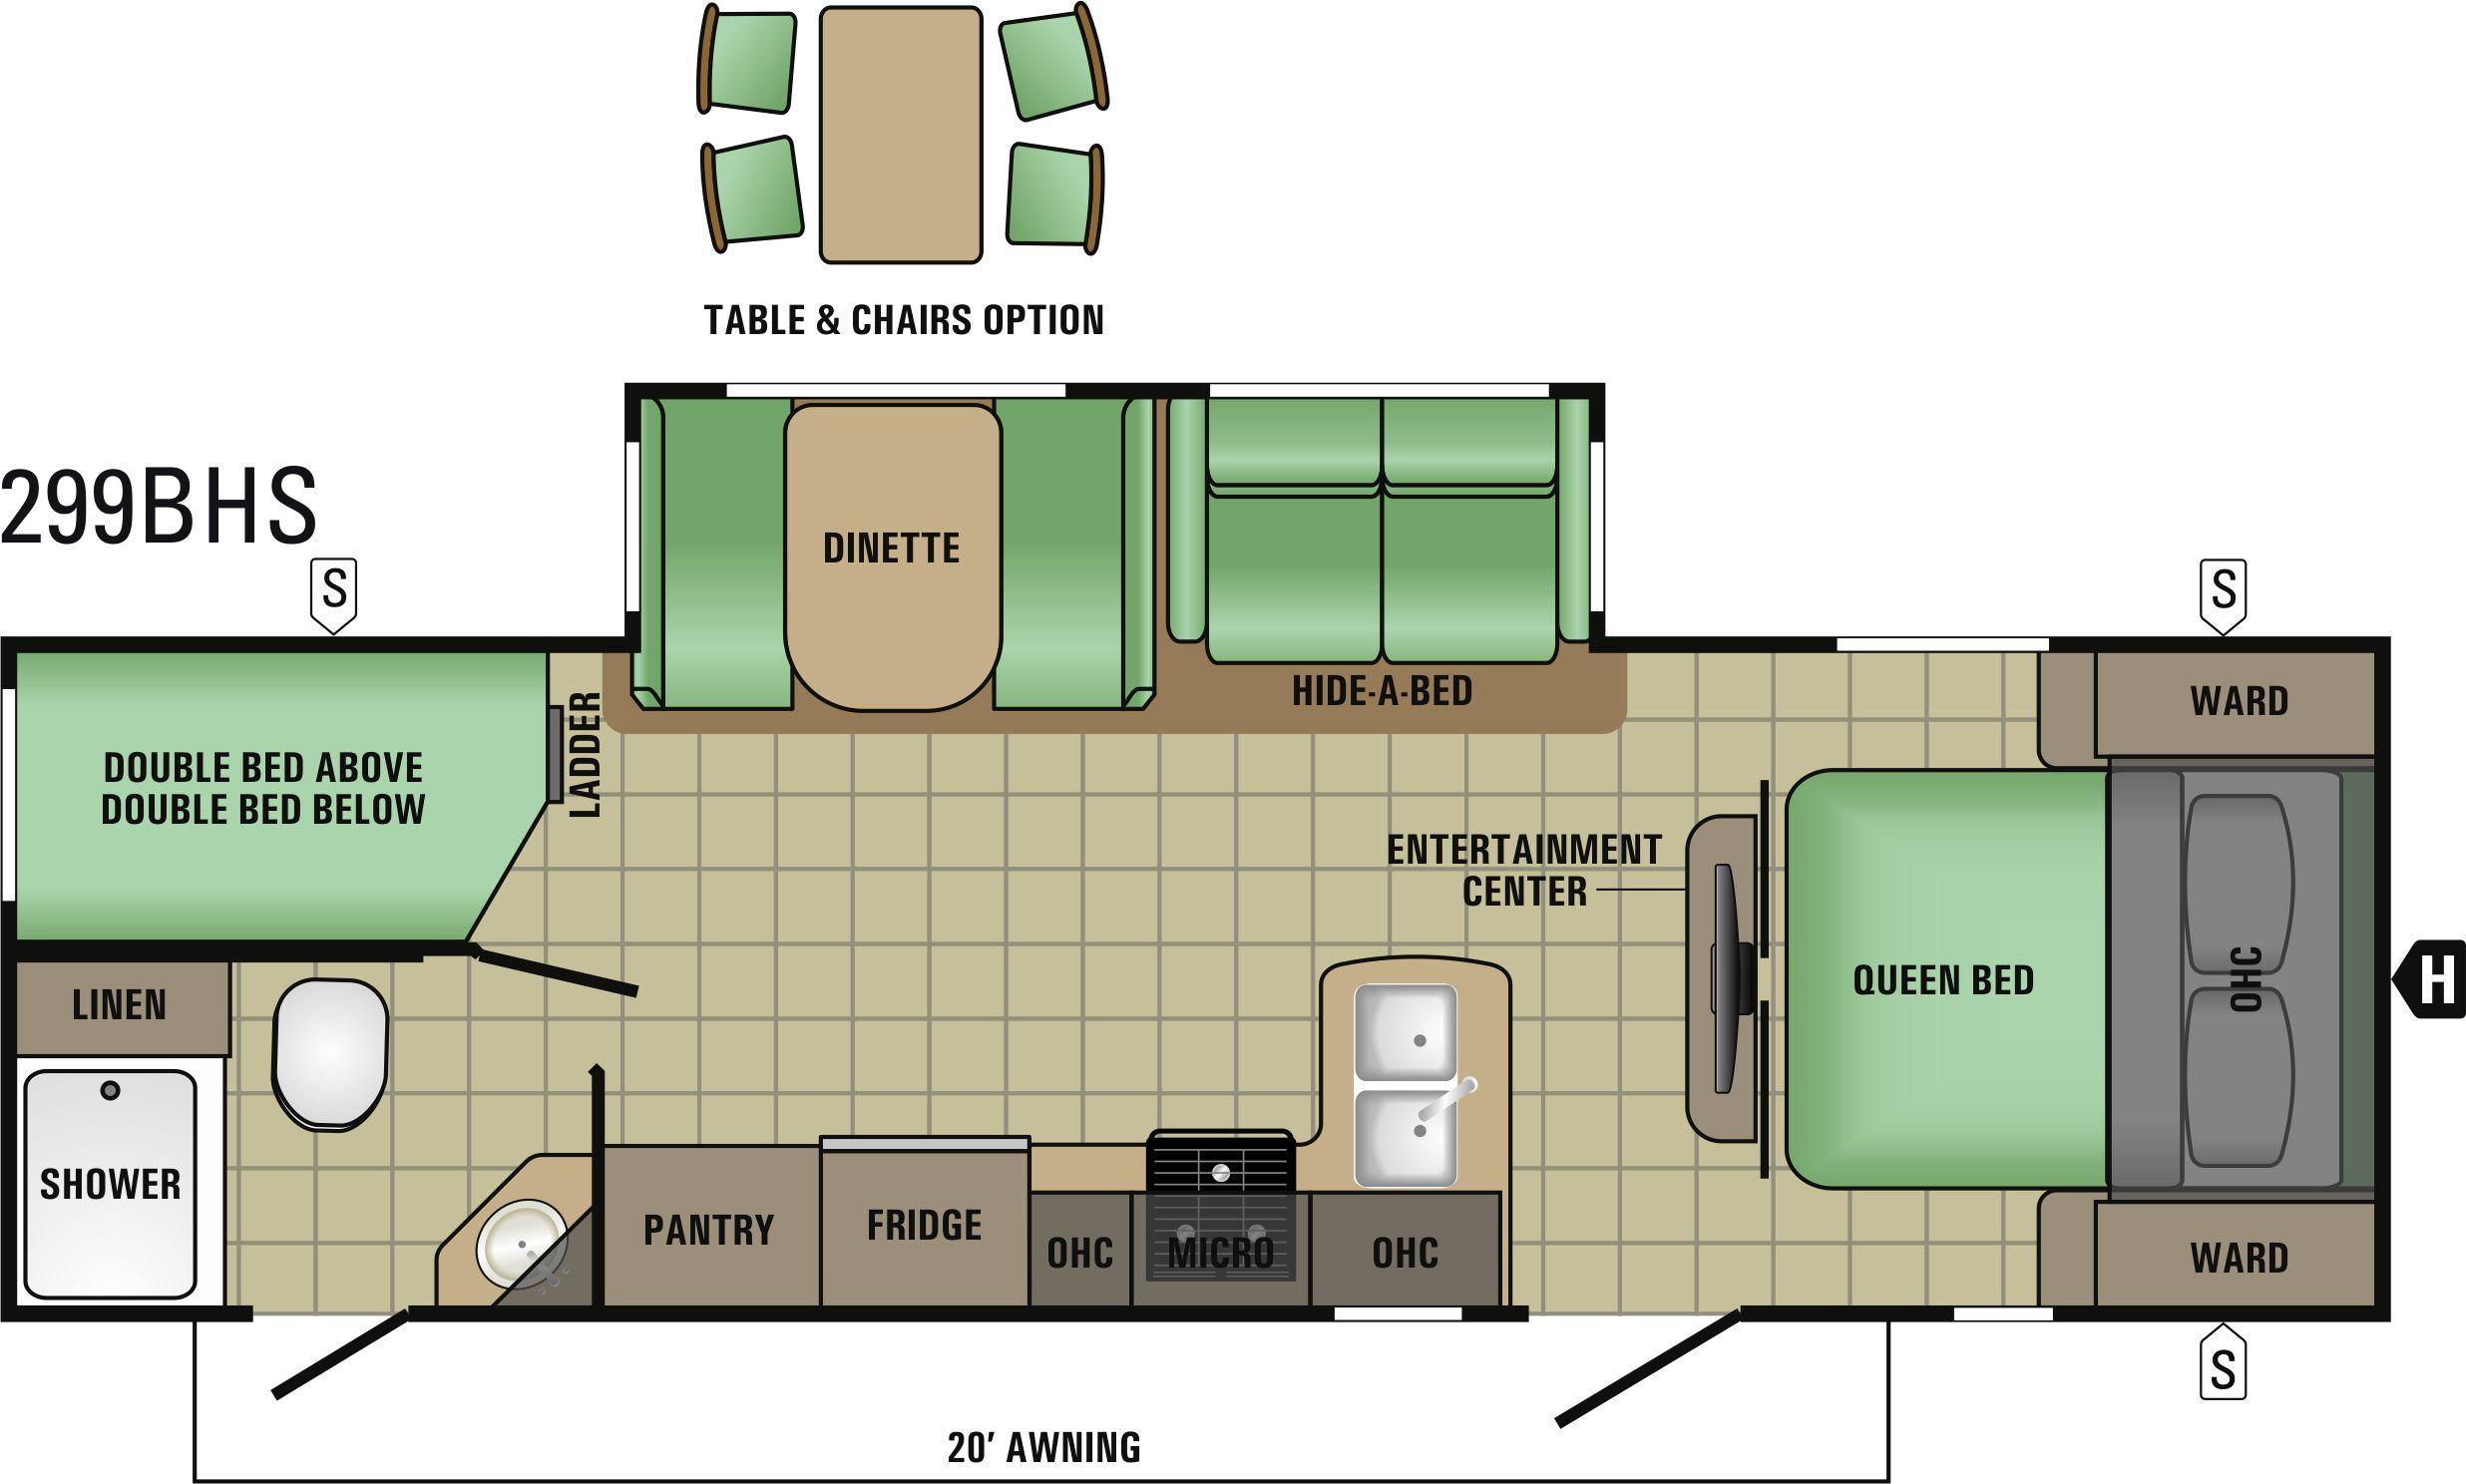 299BHS Floorplan